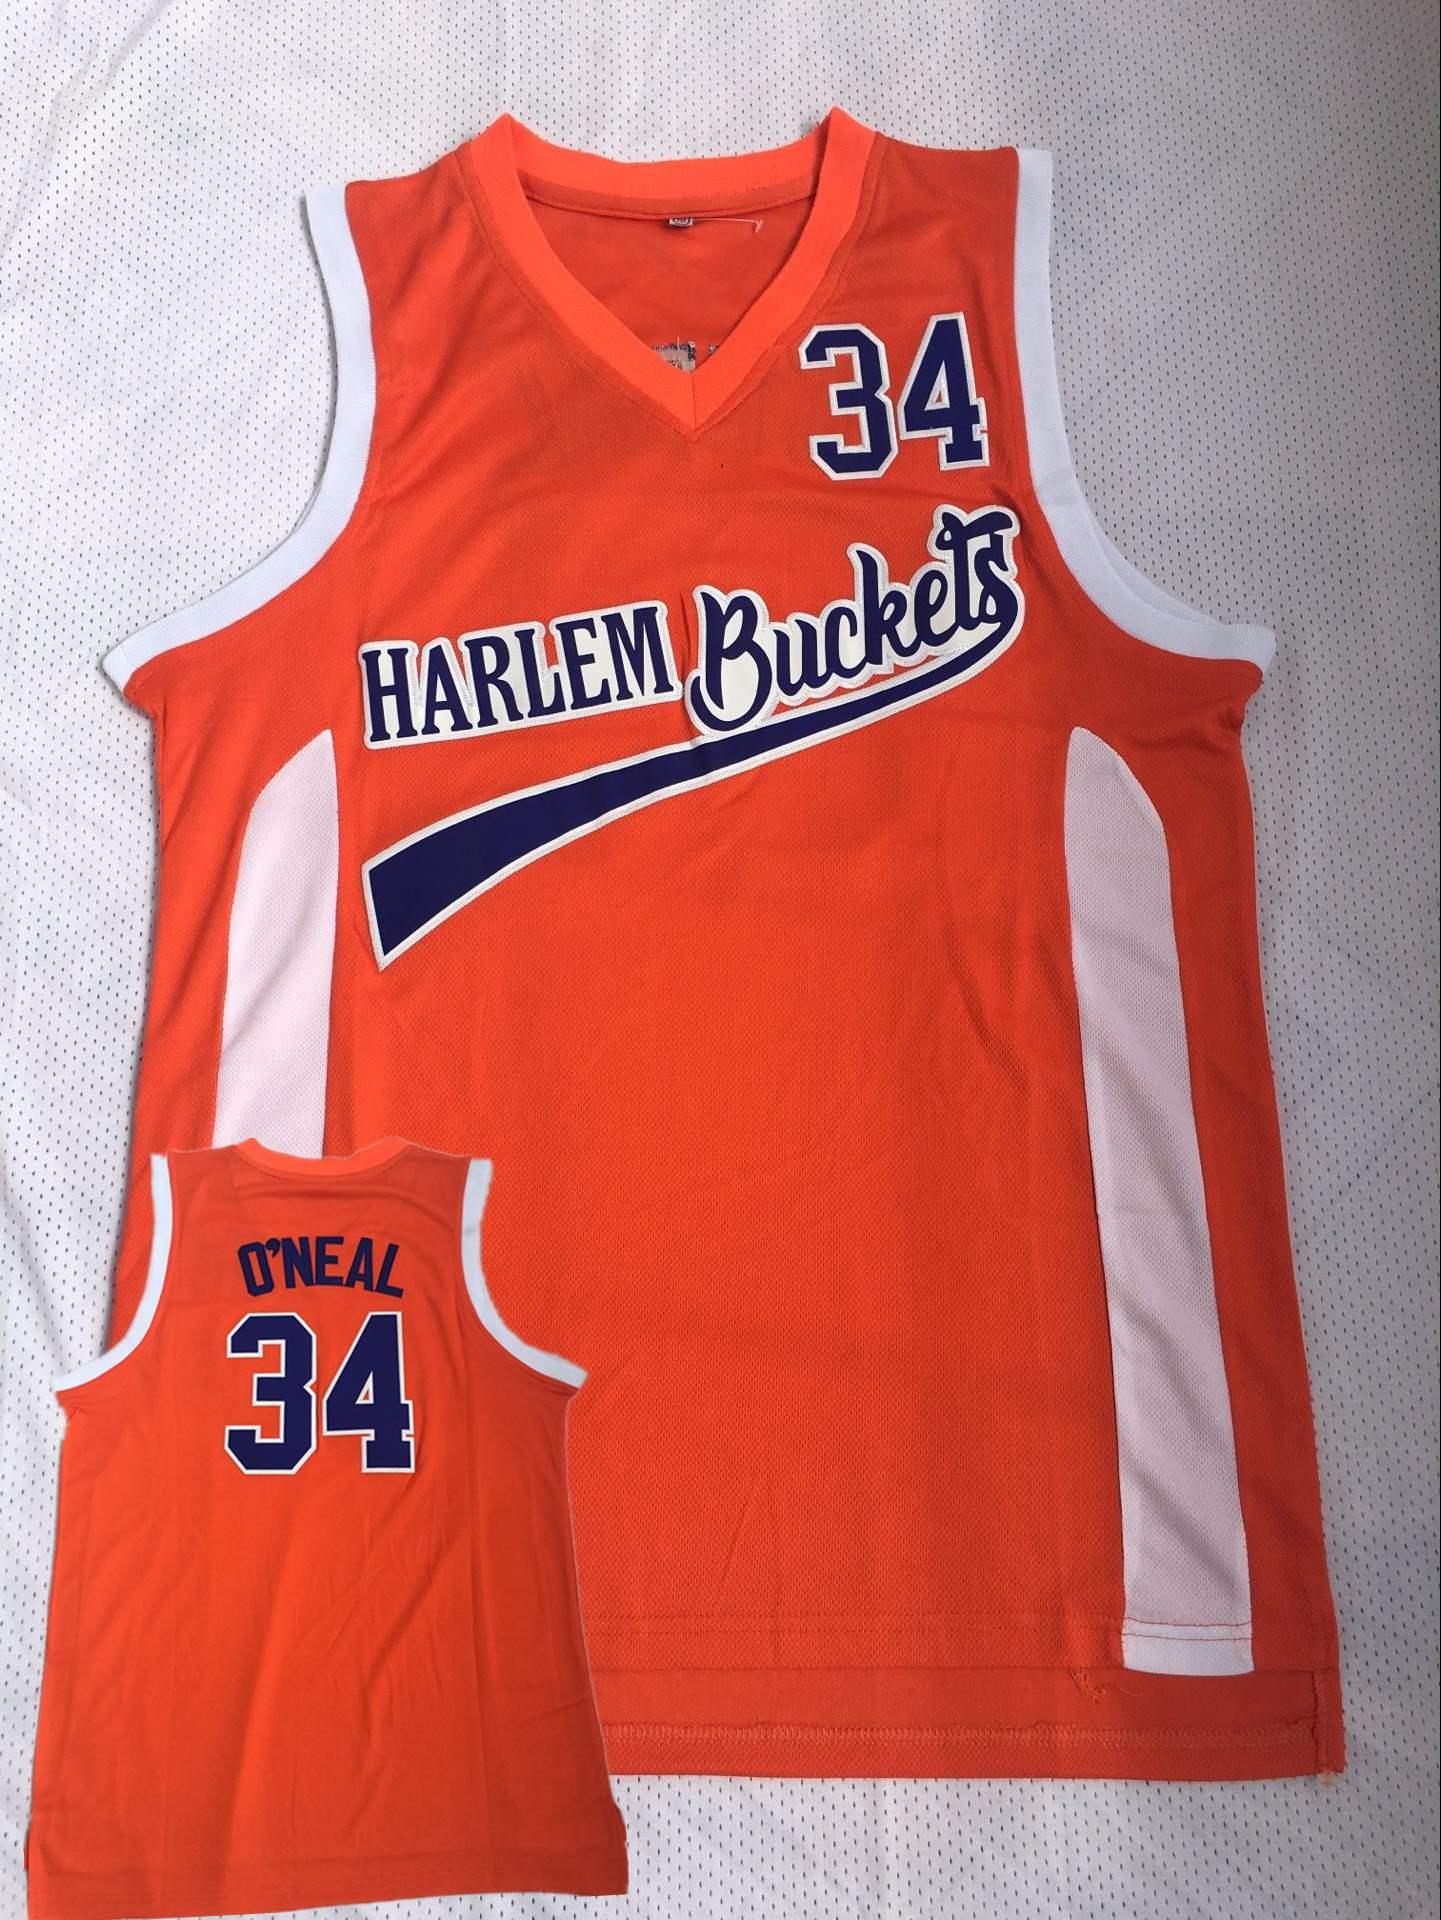 Harlem Buckets 34 O'Neal Orange Uncle Drew Movie Basketball Jersey